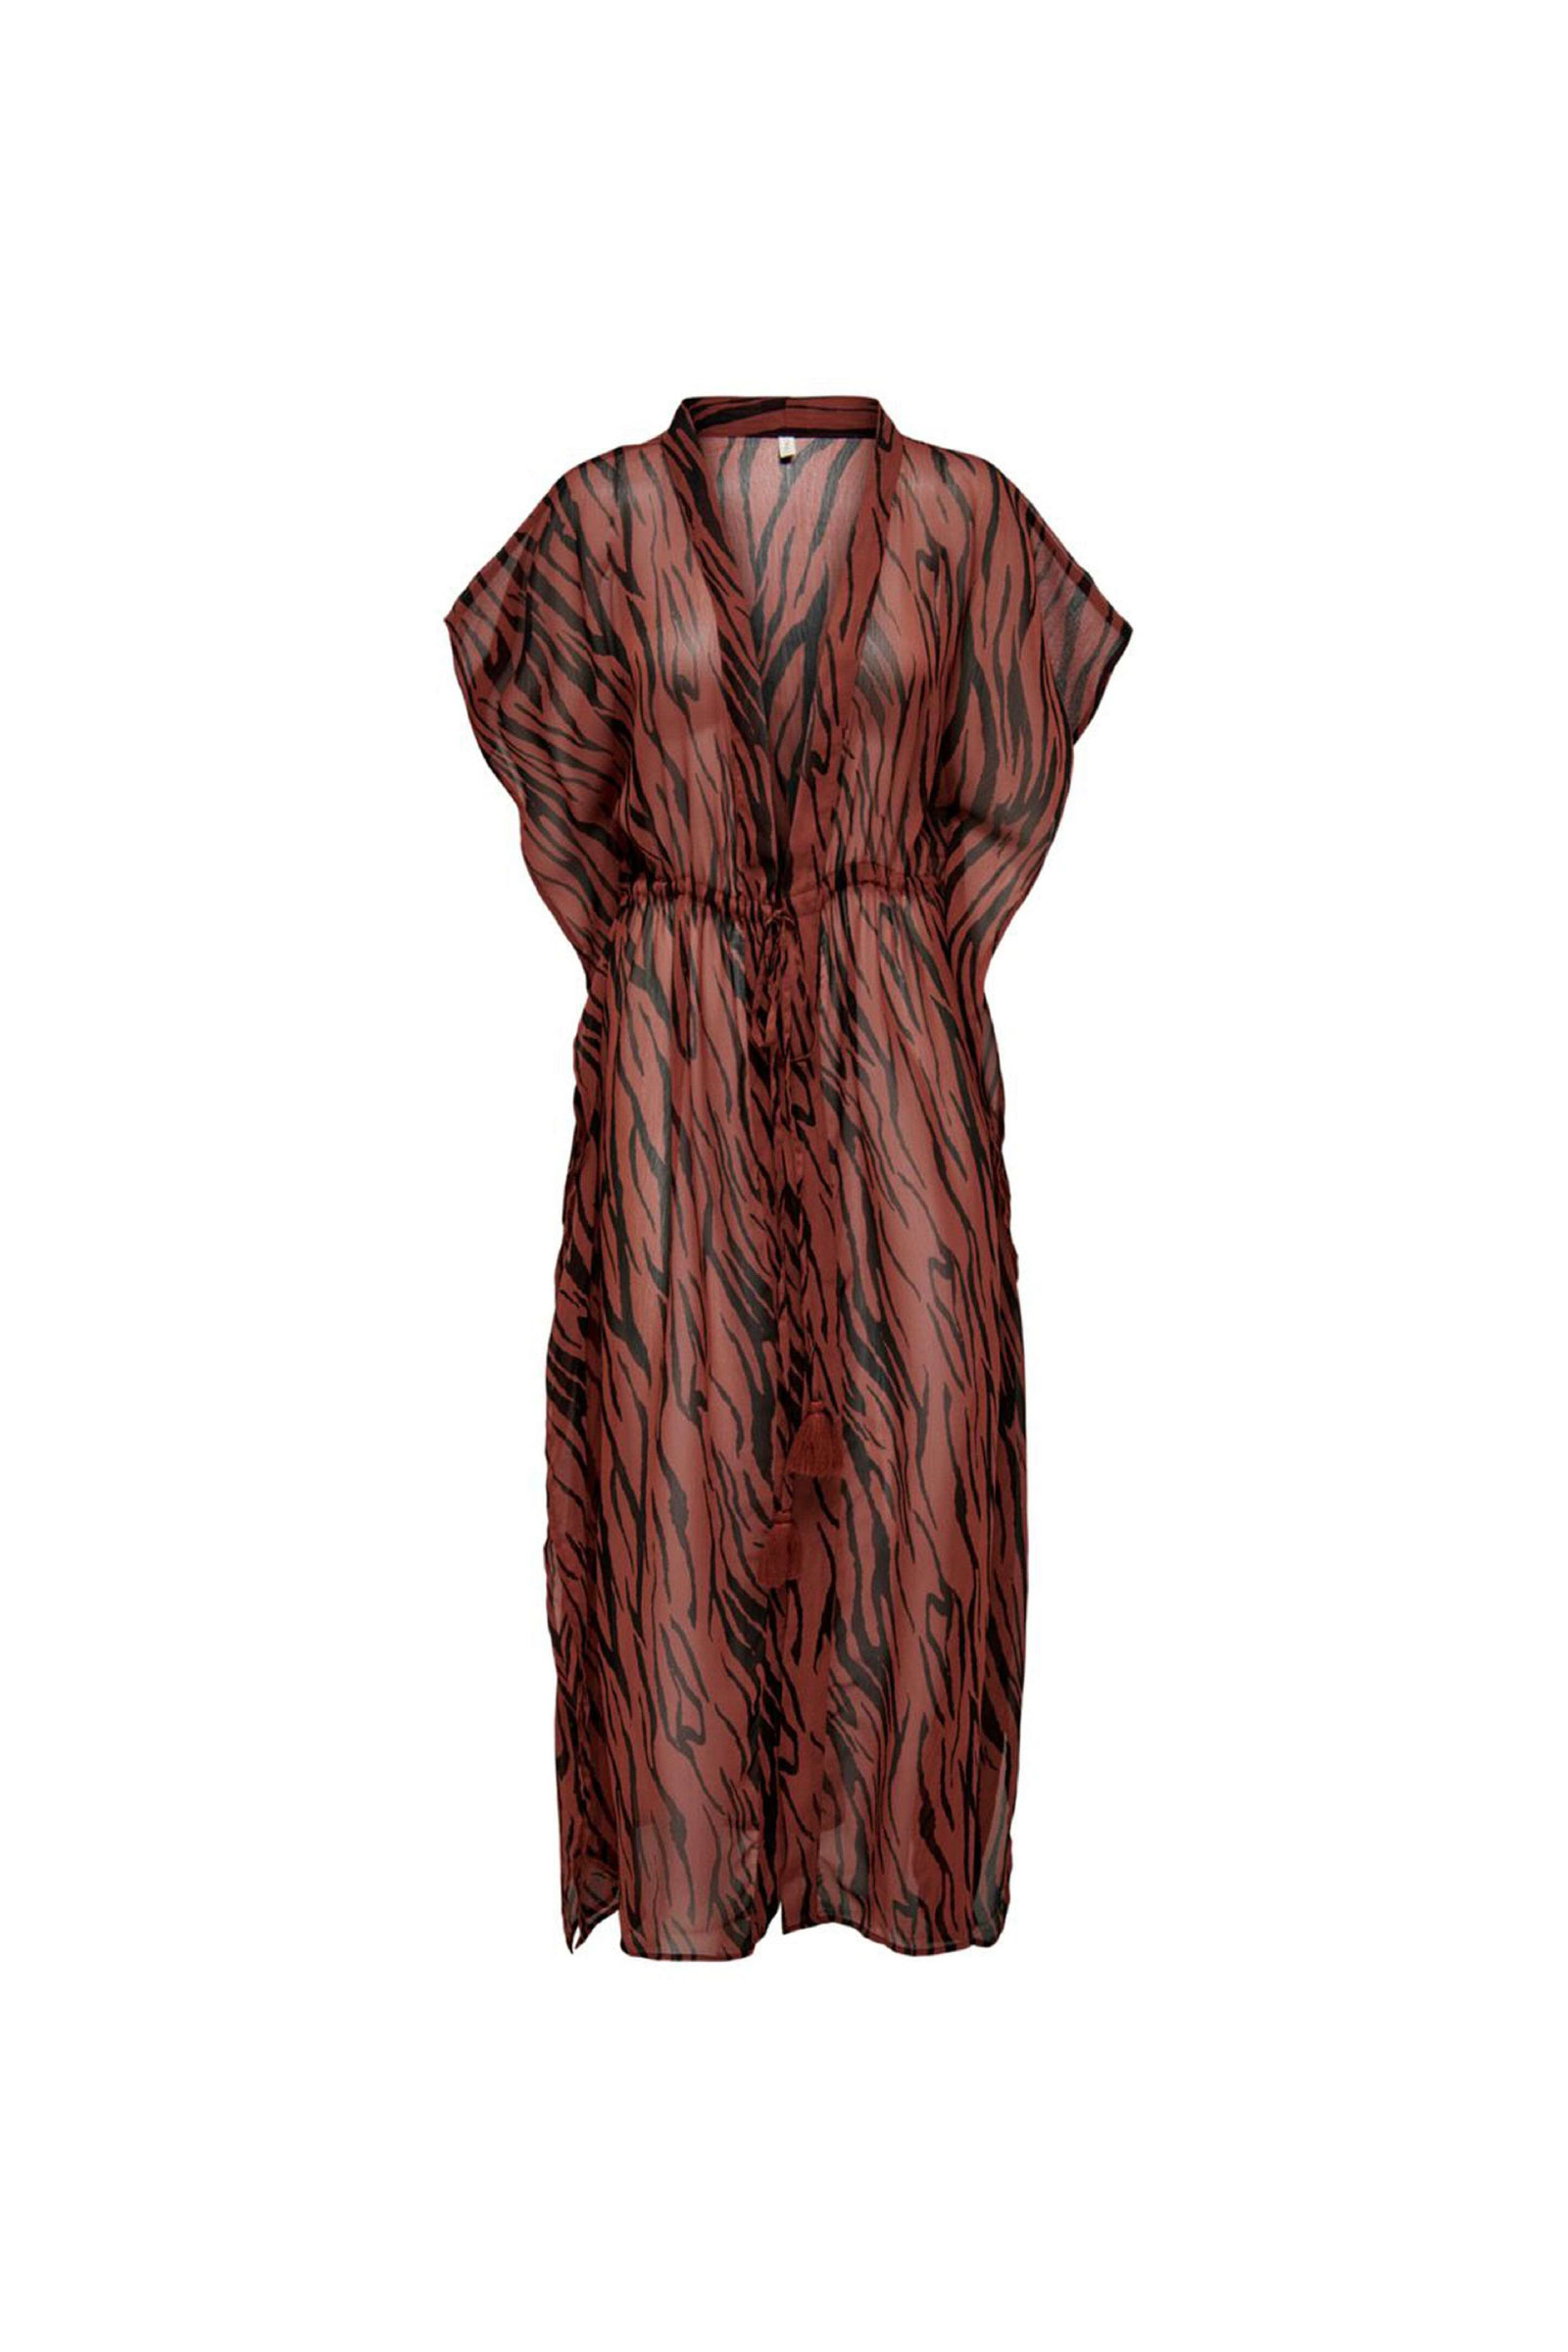 ONLY vestito Donna ONLY | Vestito | 15218756AOPZEBRA